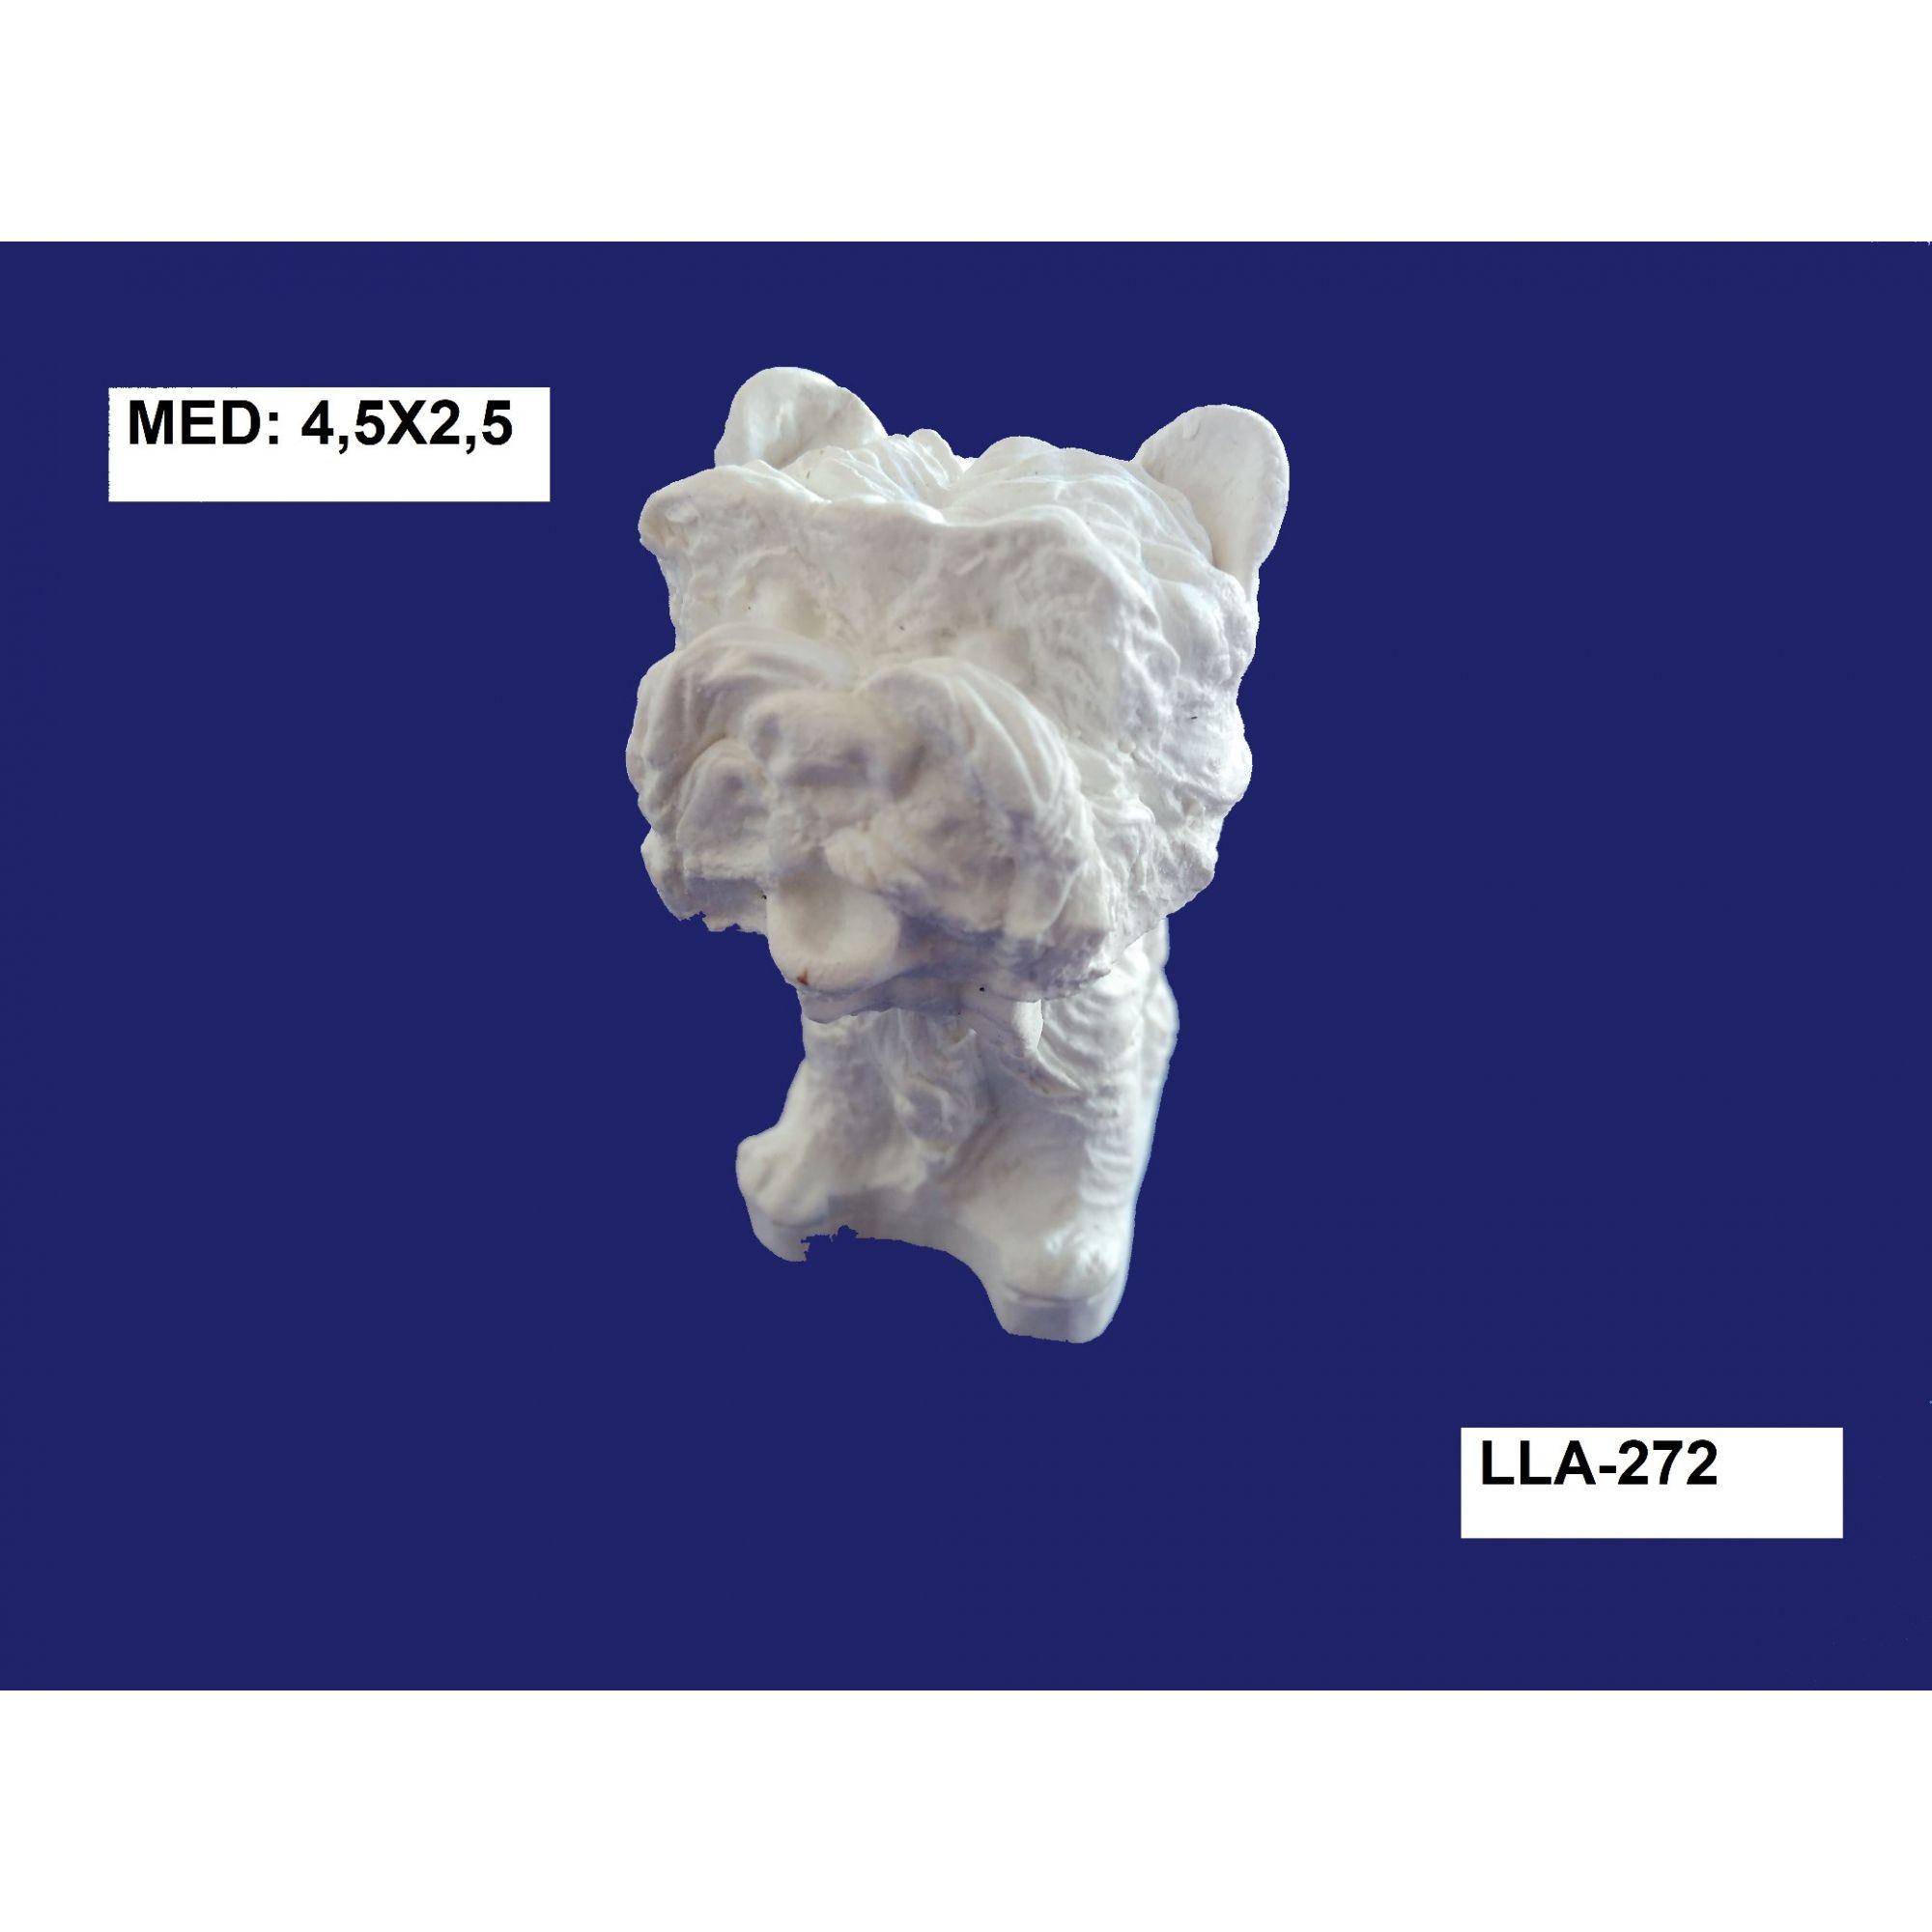 LLA-272 CACHORRO 3D 4,5X5,5CM